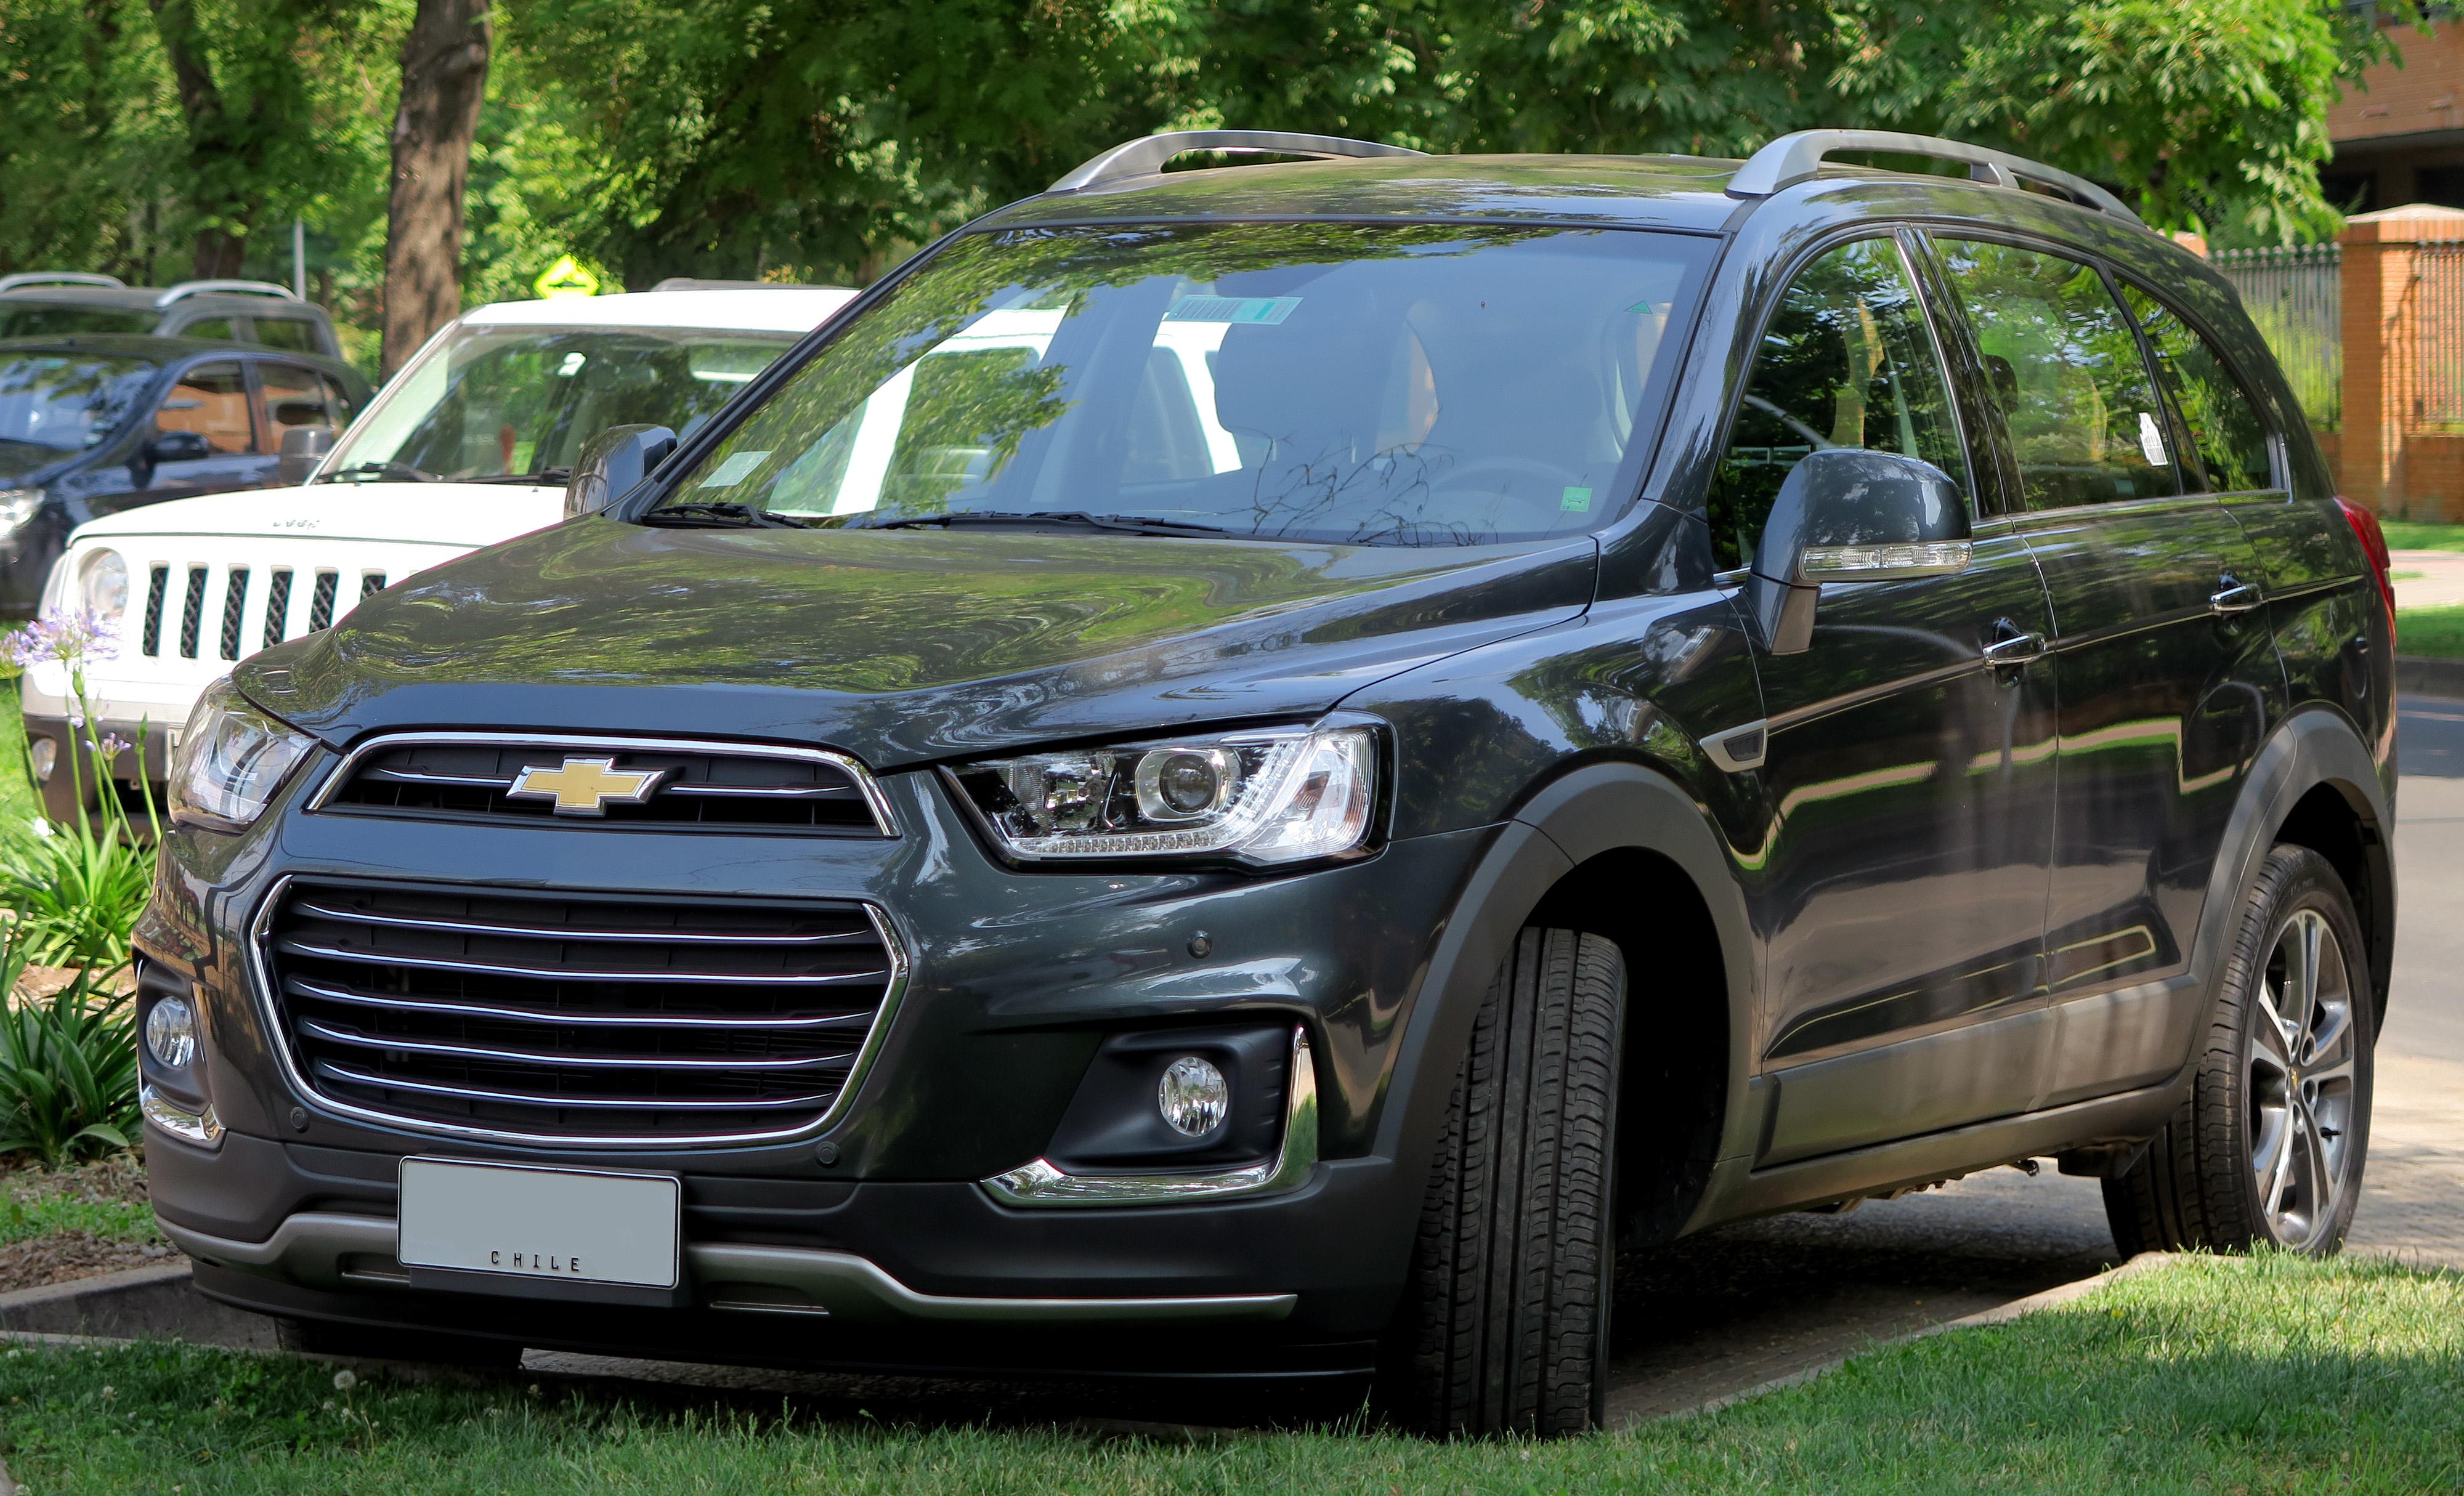 Kekurangan Chevrolet Captiva 2018 Murah Berkualitas